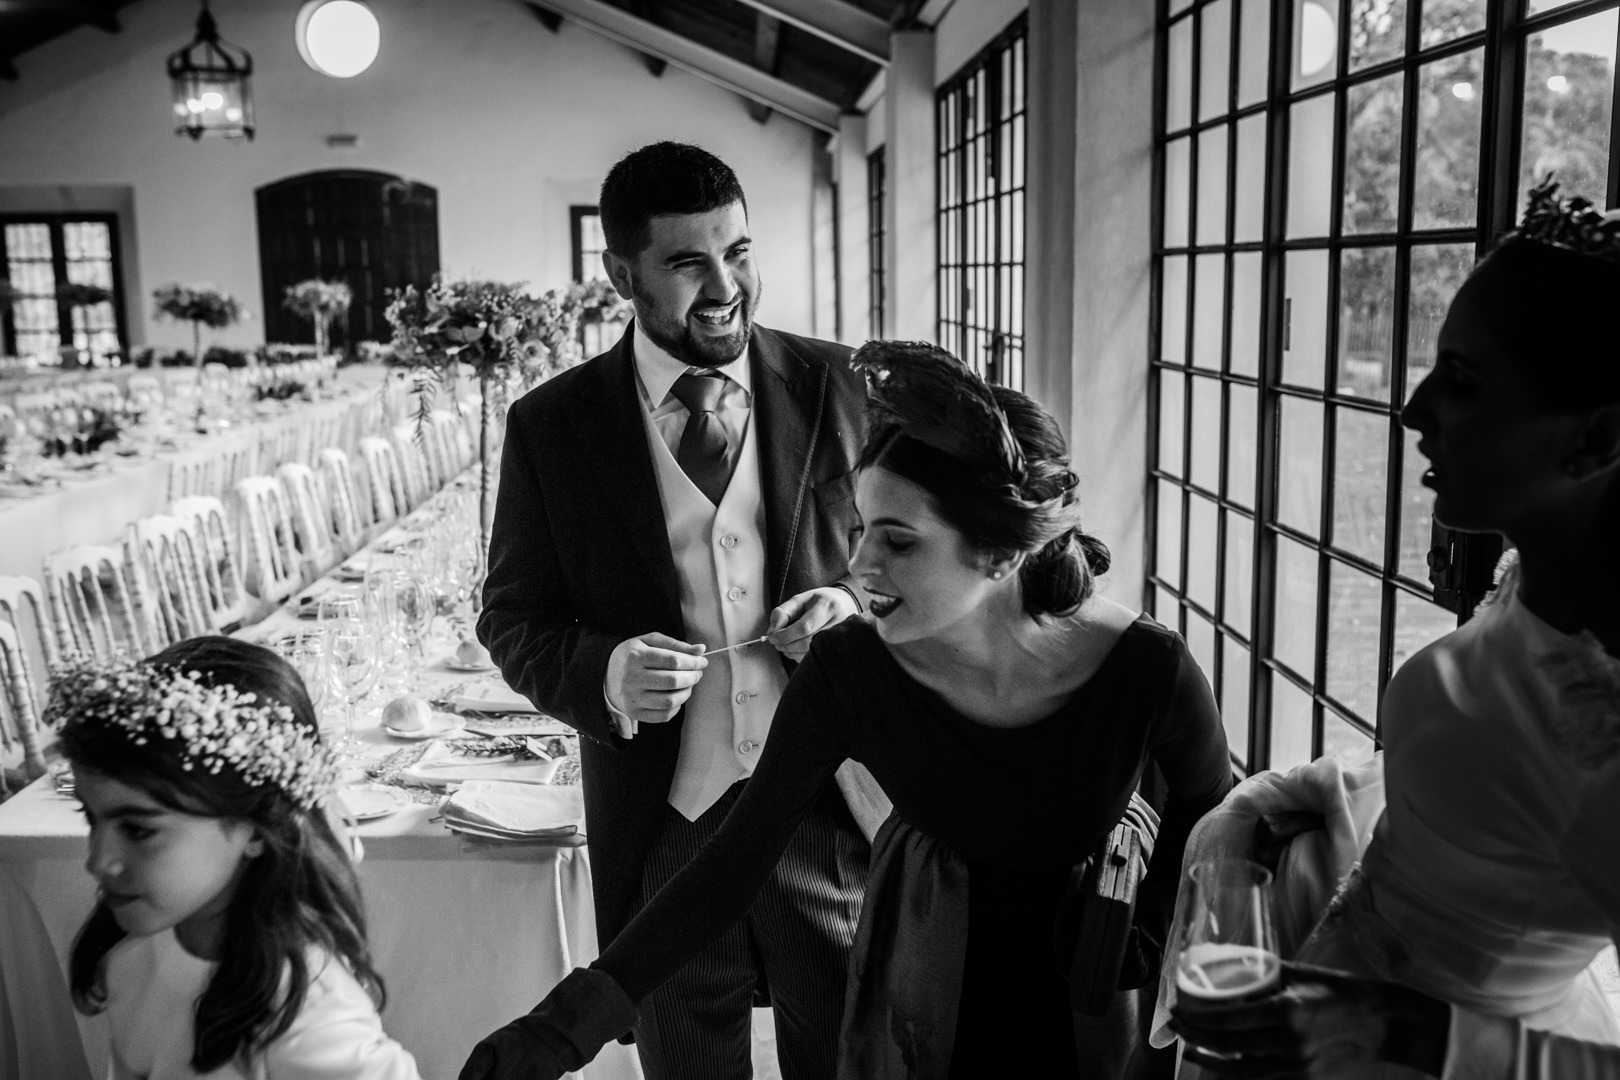 Boda-sevilla-Wedding-engagement-Rafael-Torres-fotografo-bodas-sevilla-madrid-barcelona-wedding-photographer--51.jpg